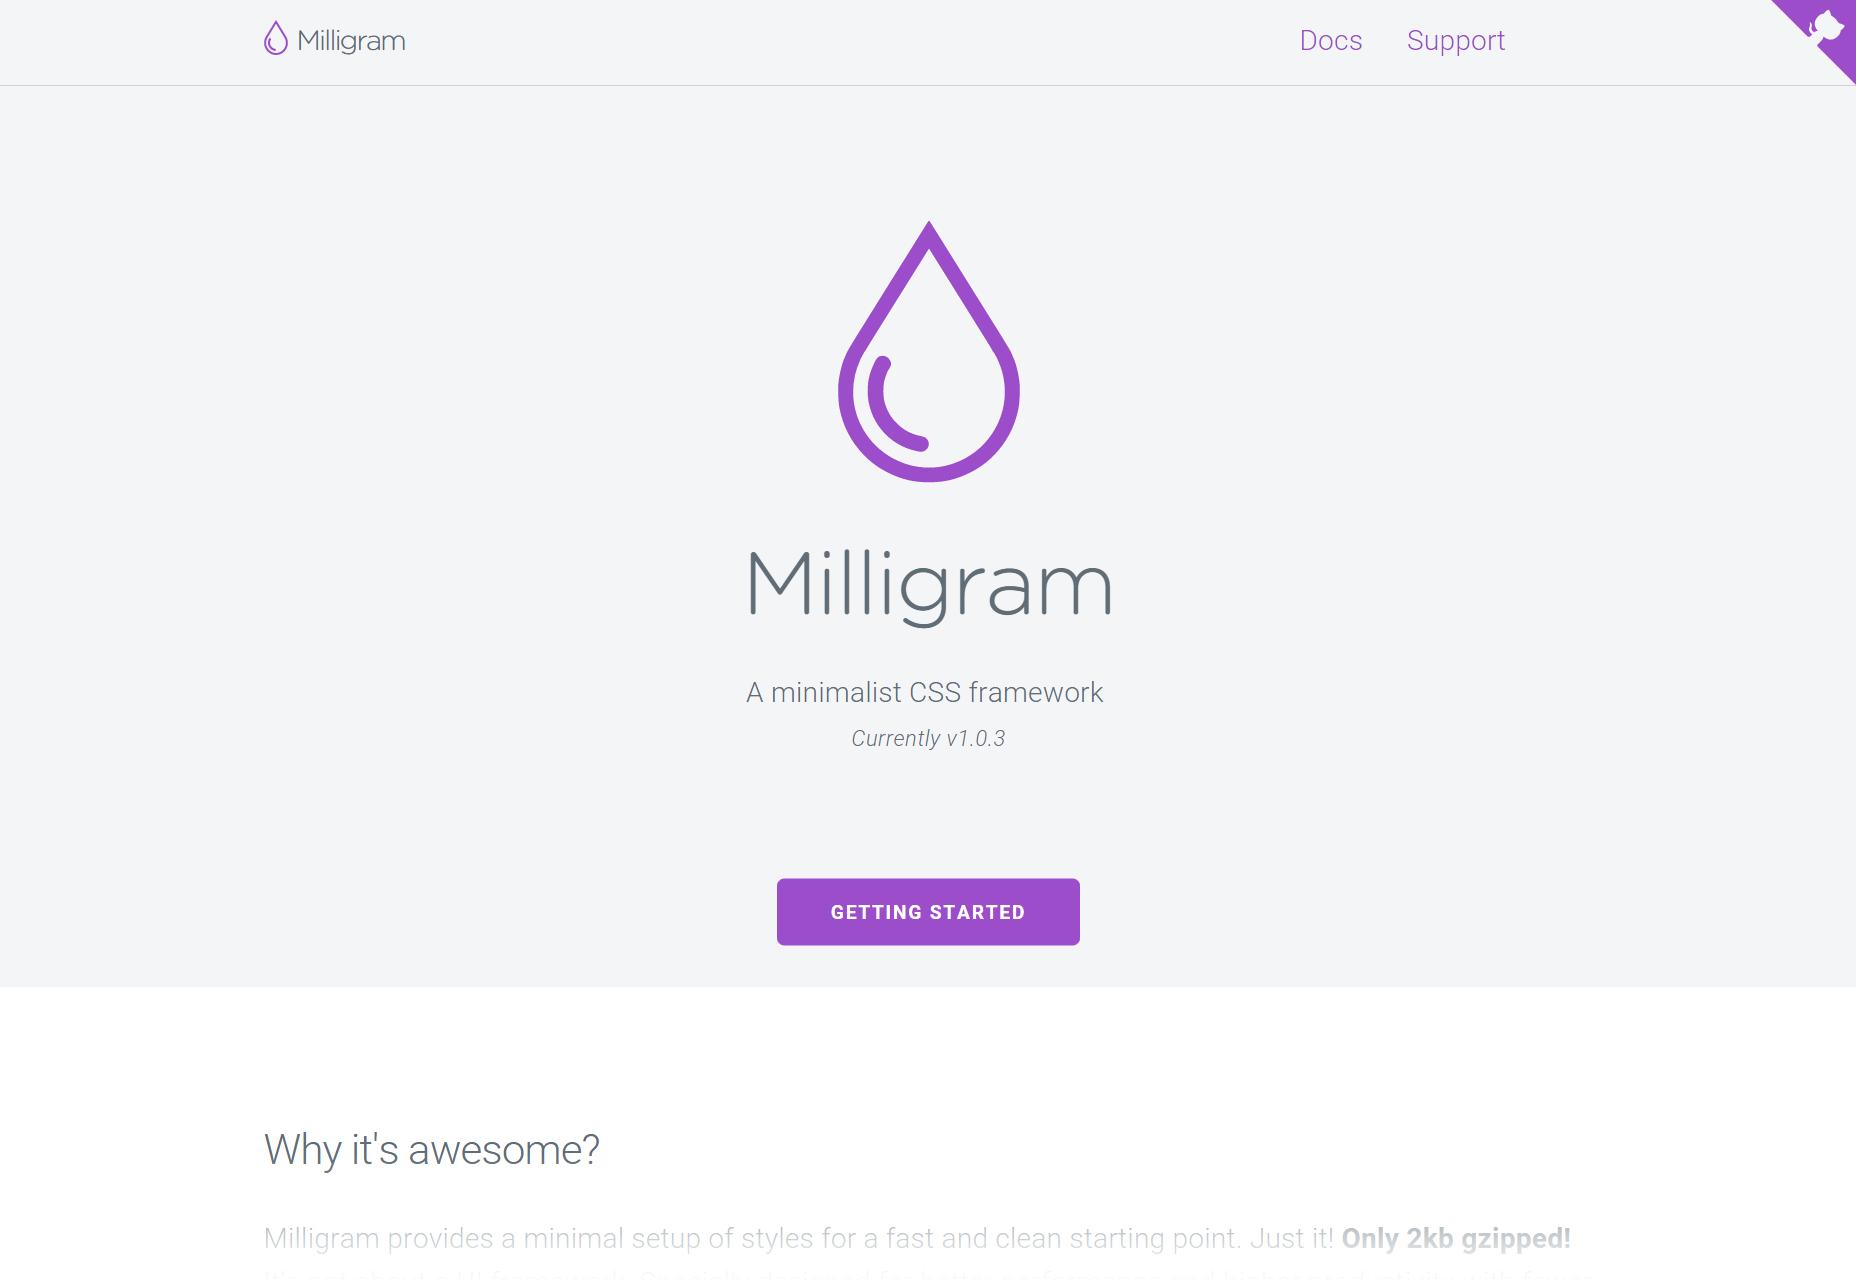 Milligram: Minimalist CSS Framework